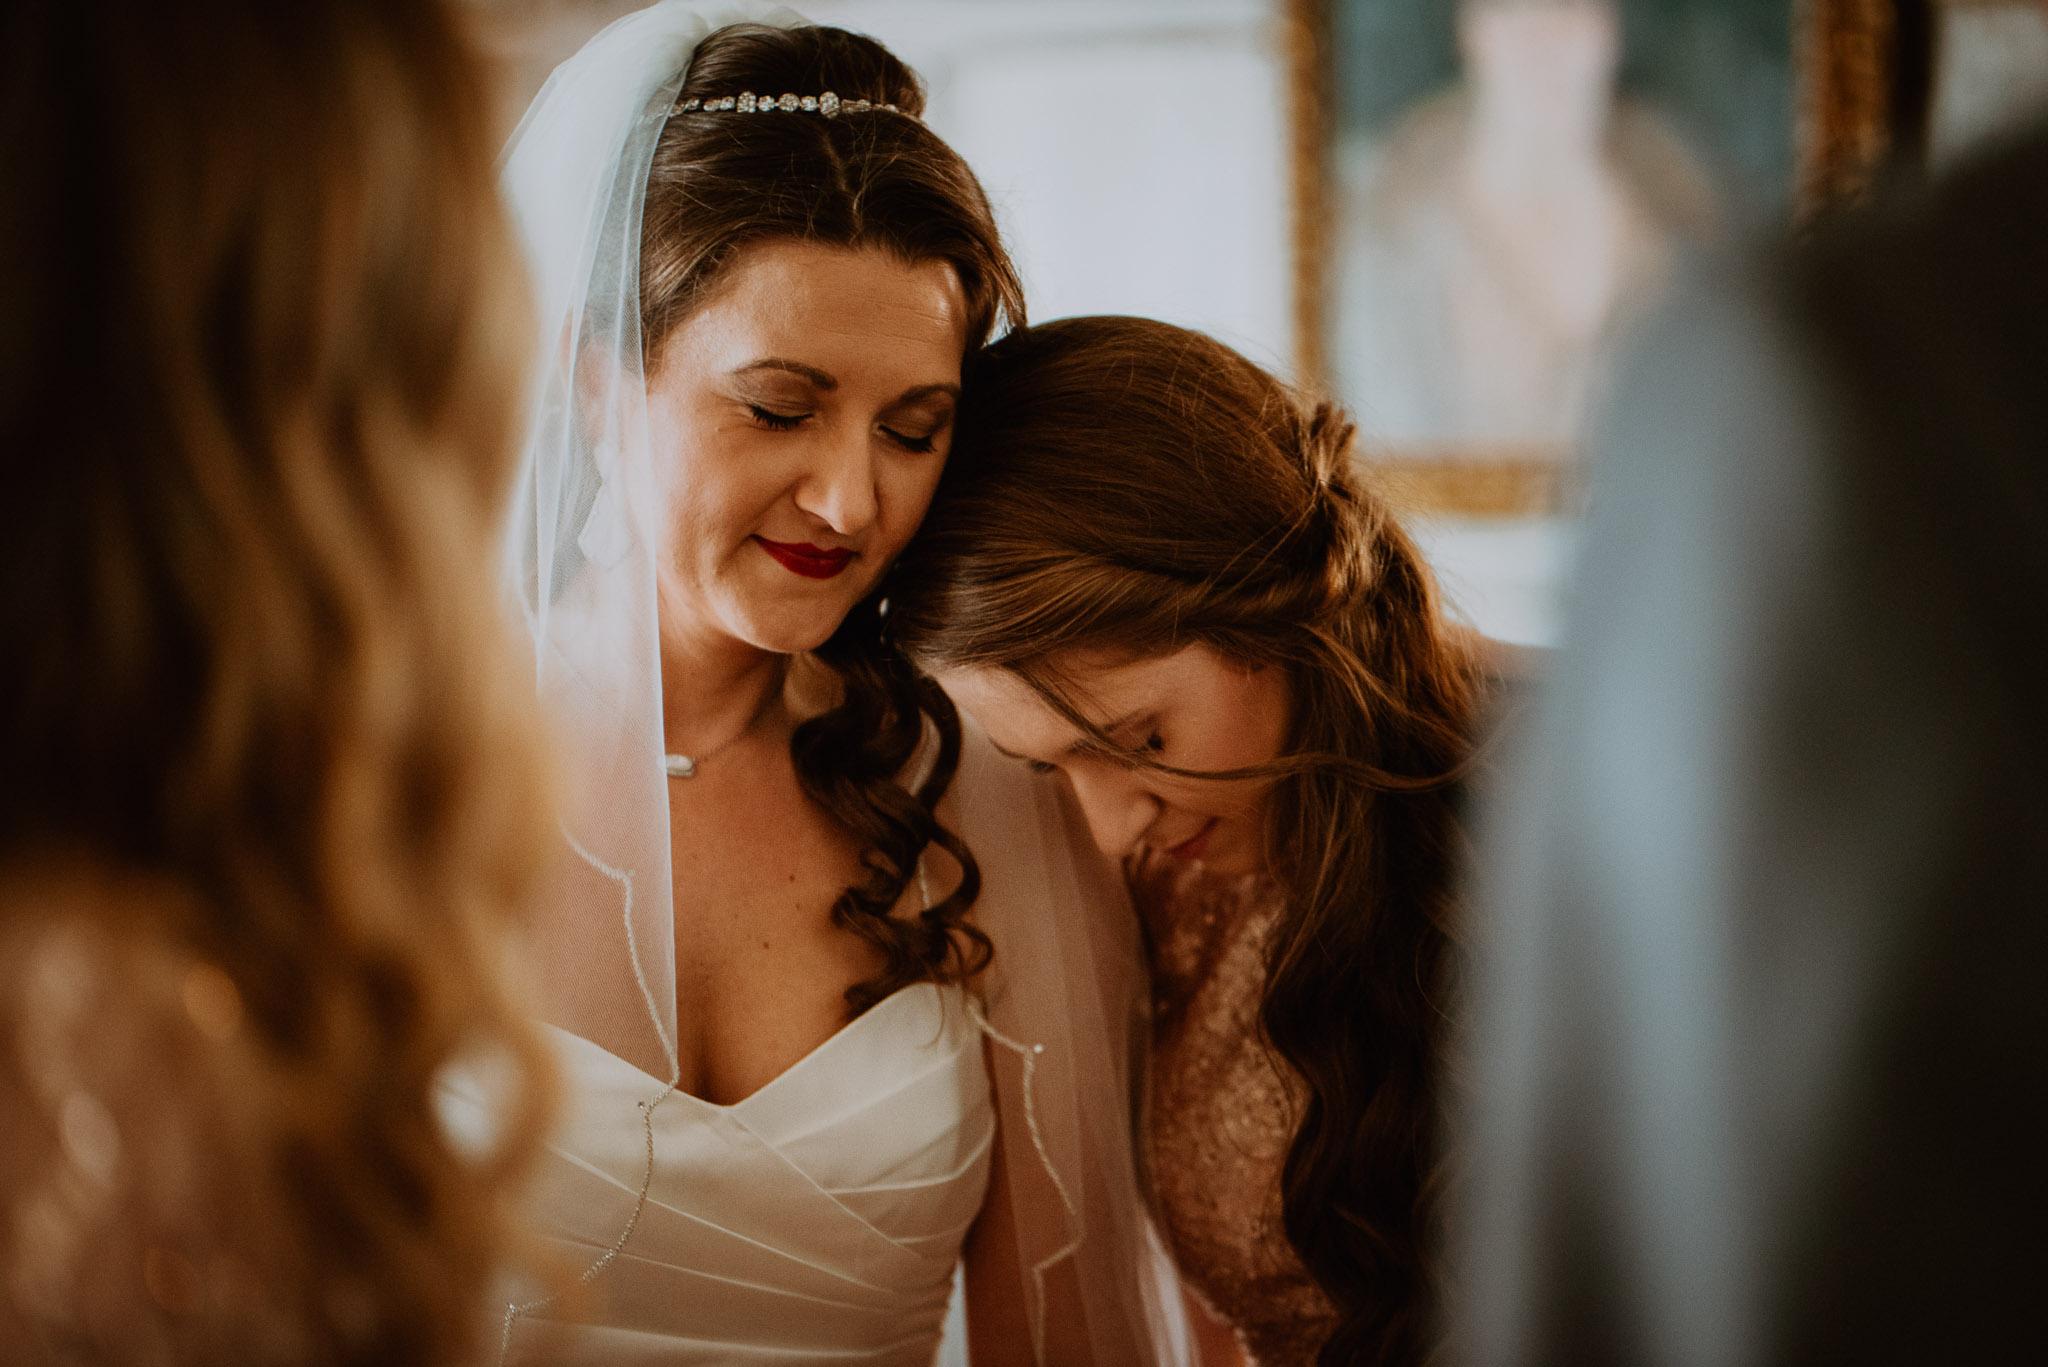 Bentwood-country-club-wedding-shea-tyson-0013.jpg